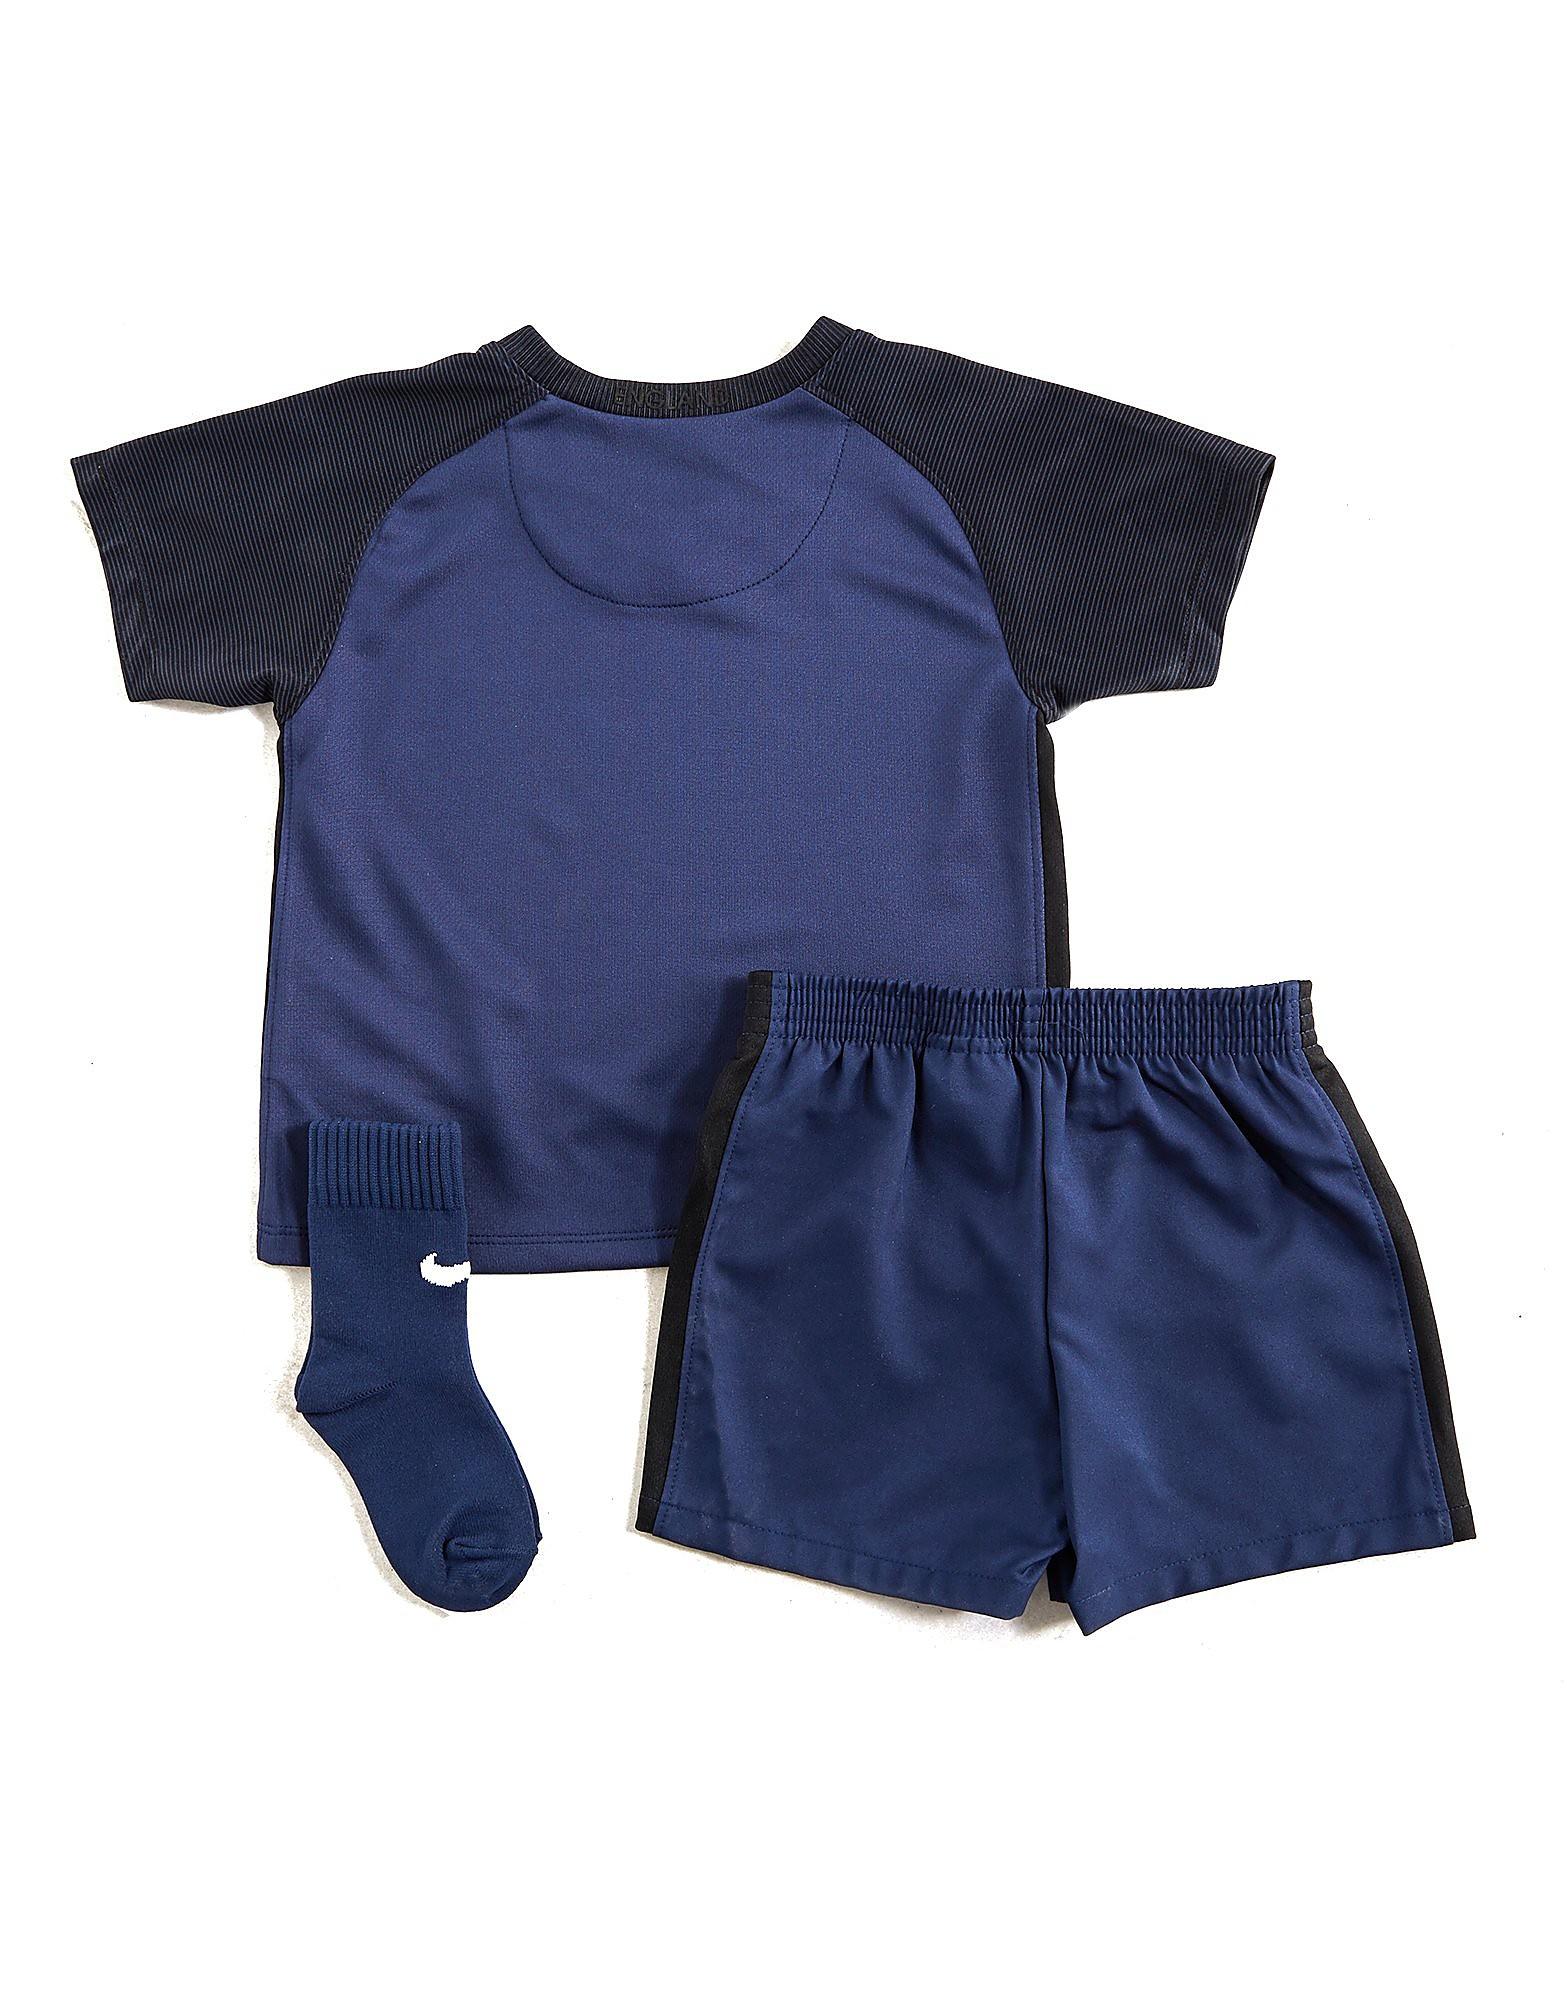 Nike England 2017/18 Infant Away Shirt